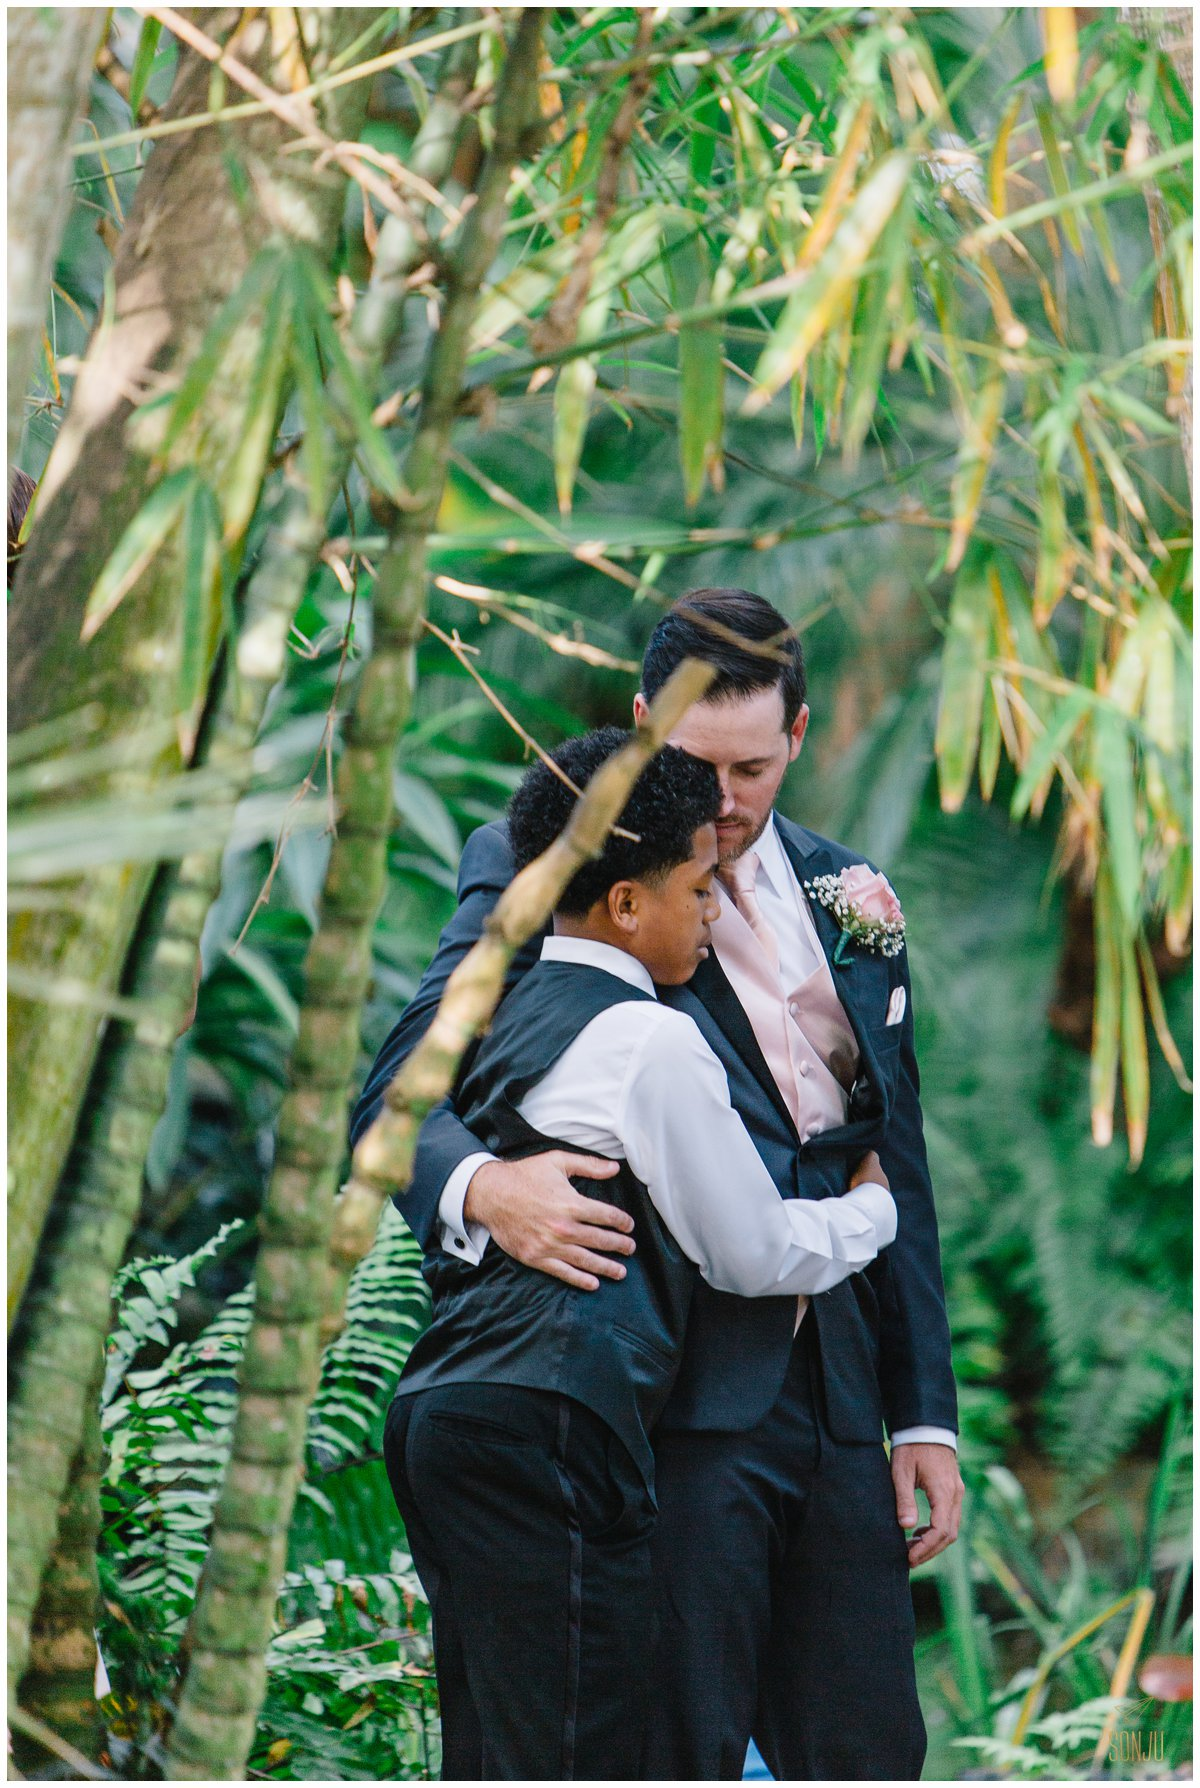 Bamboo-gallery-ft-lauderdale-wedding-tamique-bryan00021.jpg